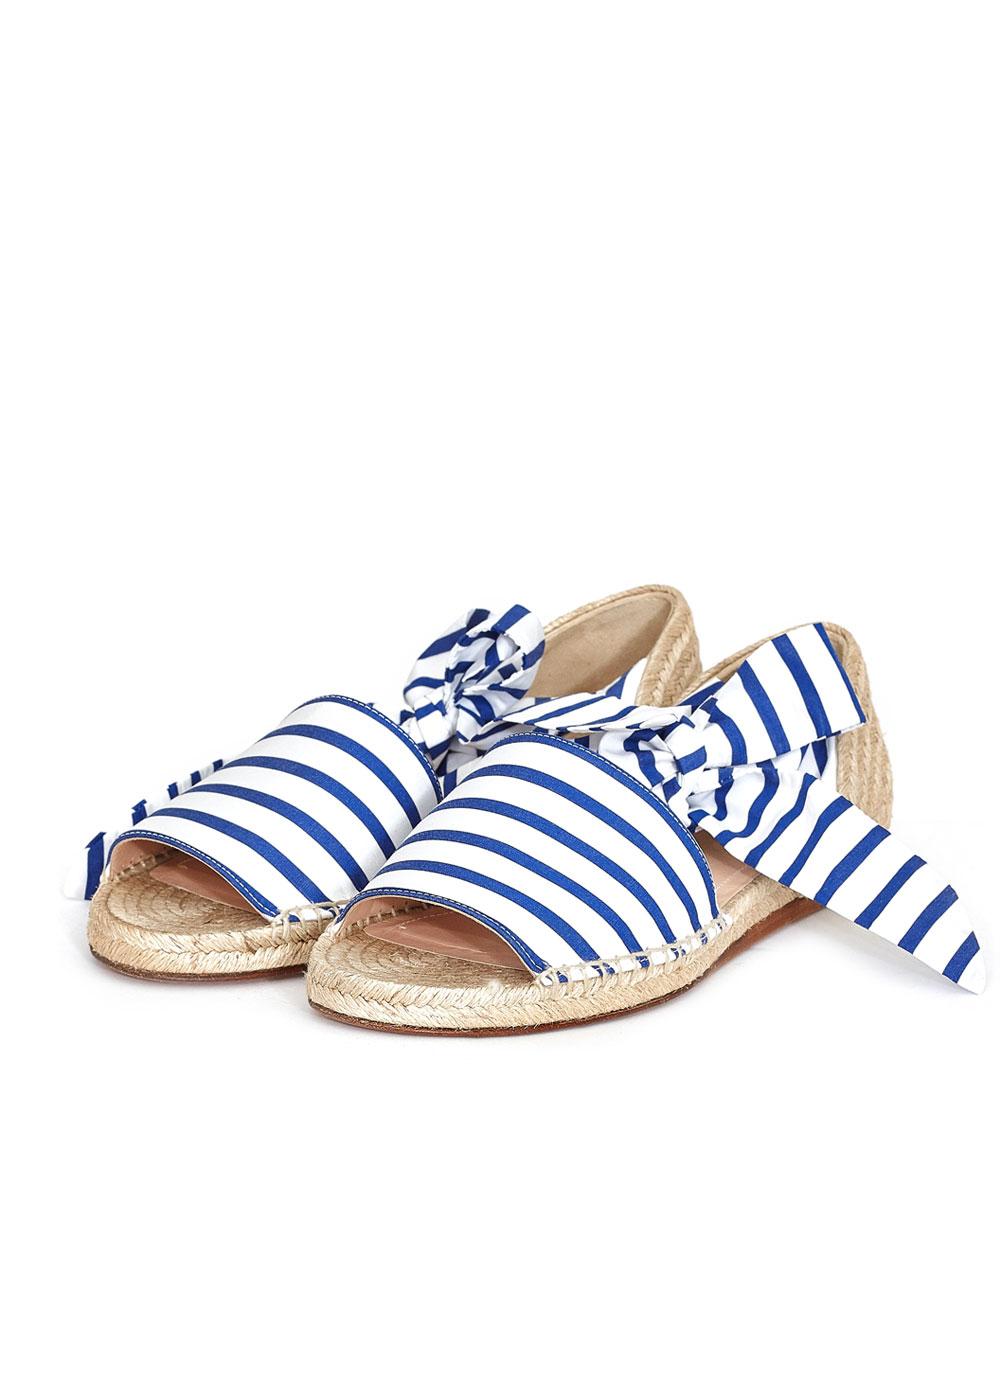 Купить Ralph Lаuren Polo сандалии